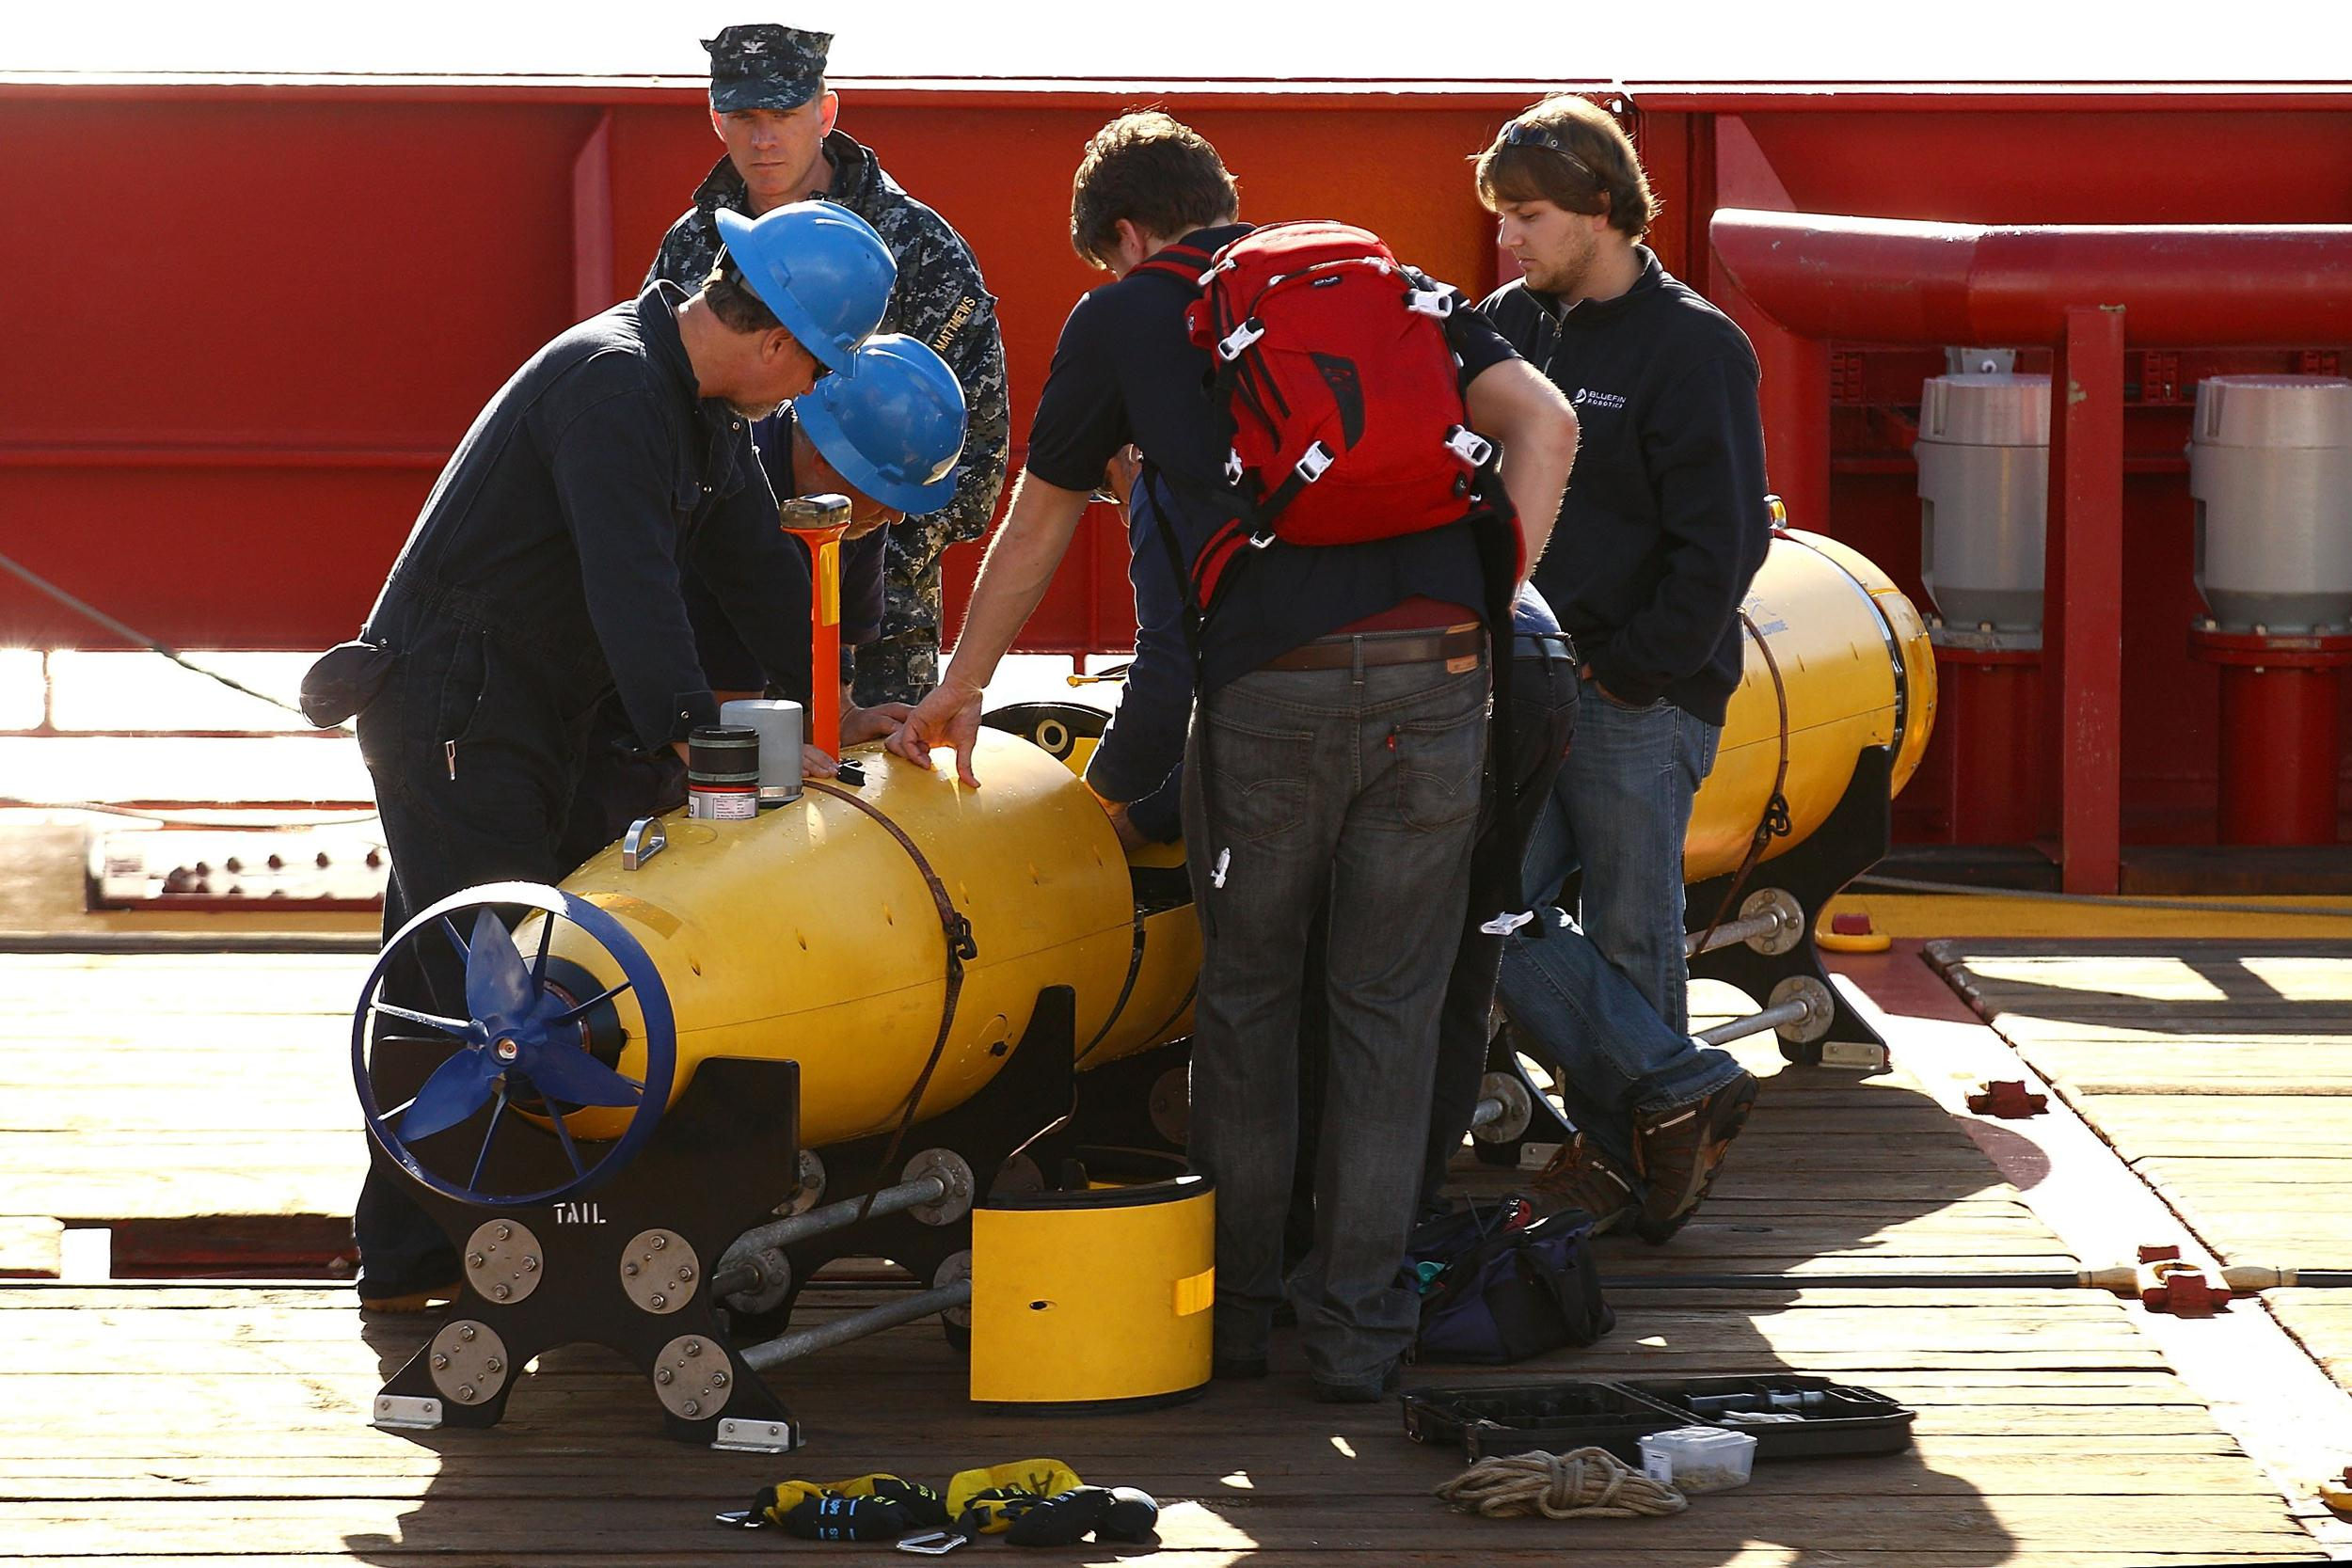 Image: Technicians work on the Bluefin-21 autonomous underwater vehicle